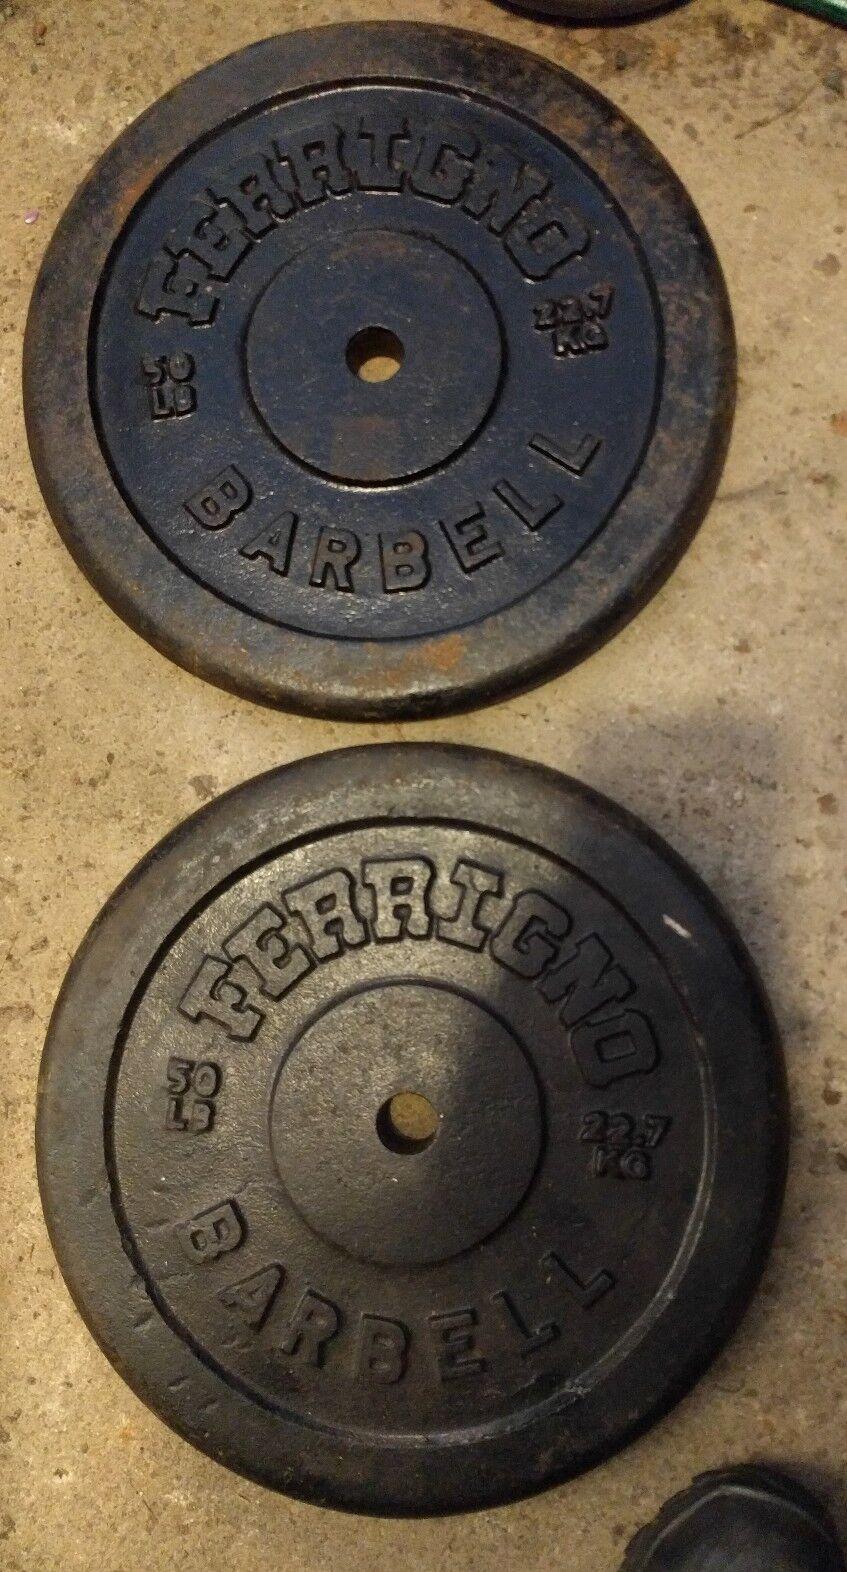 Ferrigno Standard 50 lb Pair Weight Plates Vintage 1 1/16